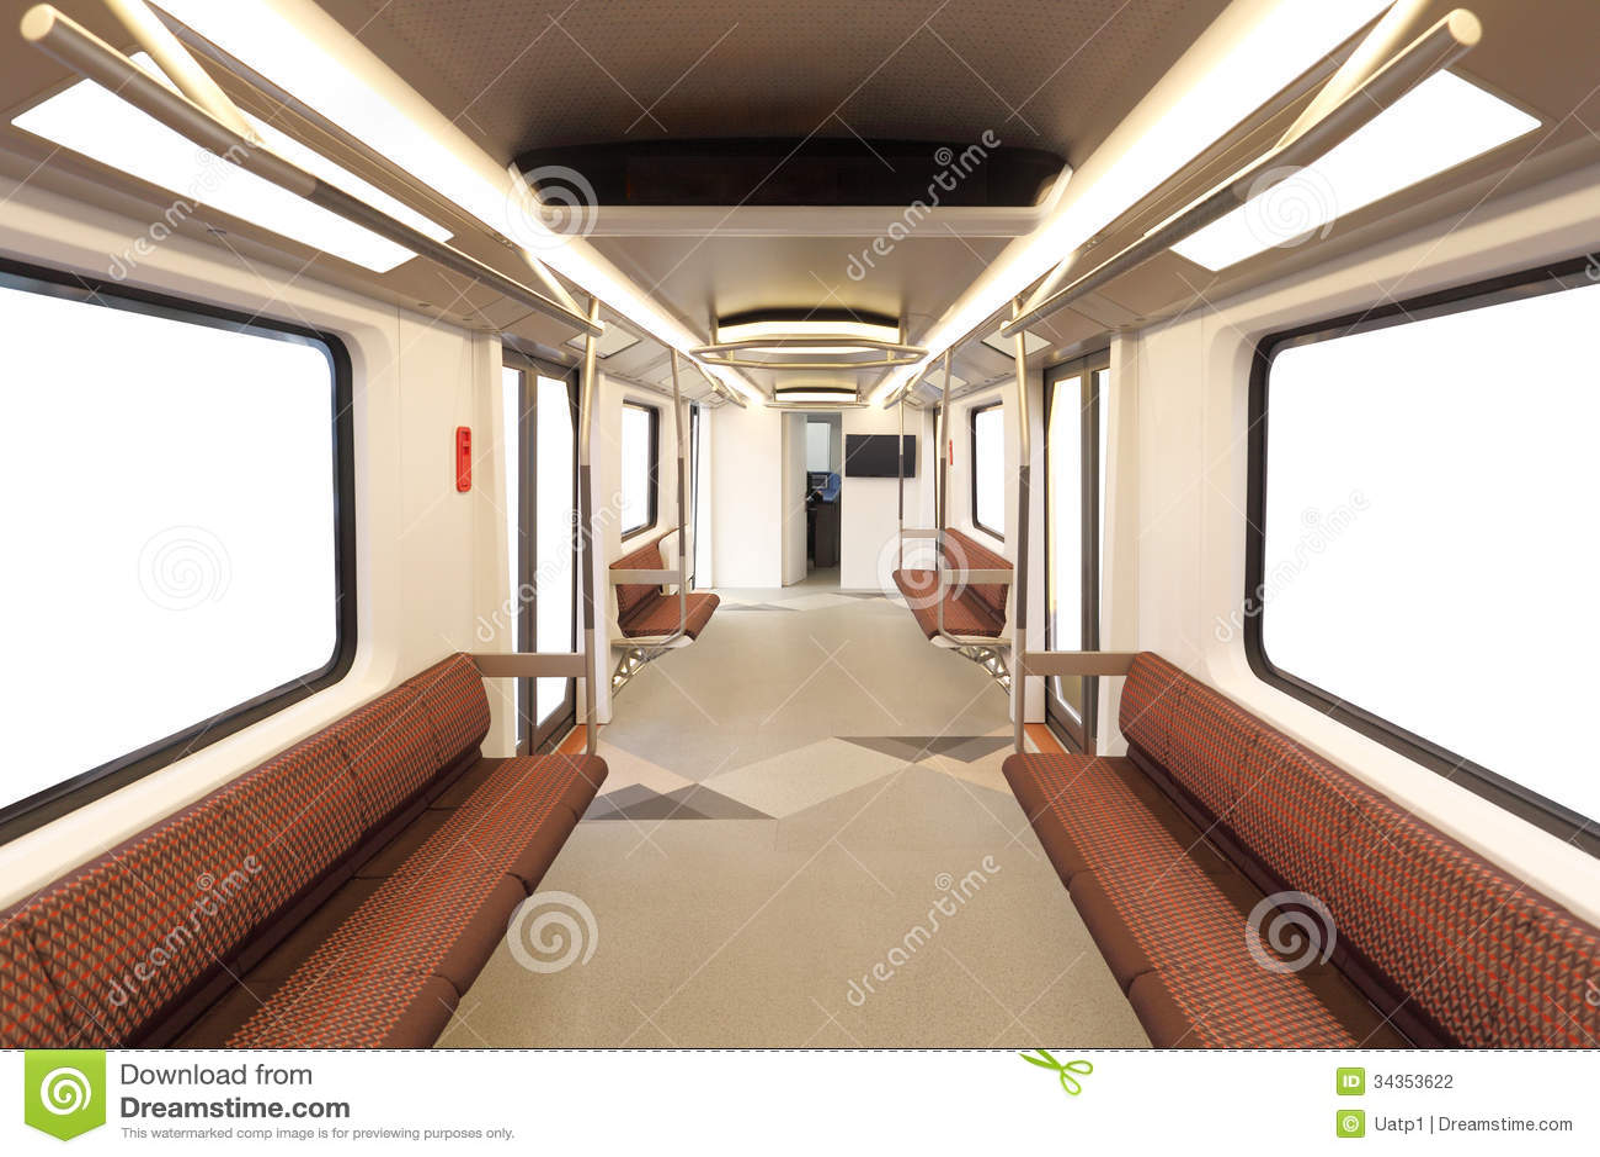 Metro carriage stock photo image of station coach underground 34353622 - Carrage metro ...